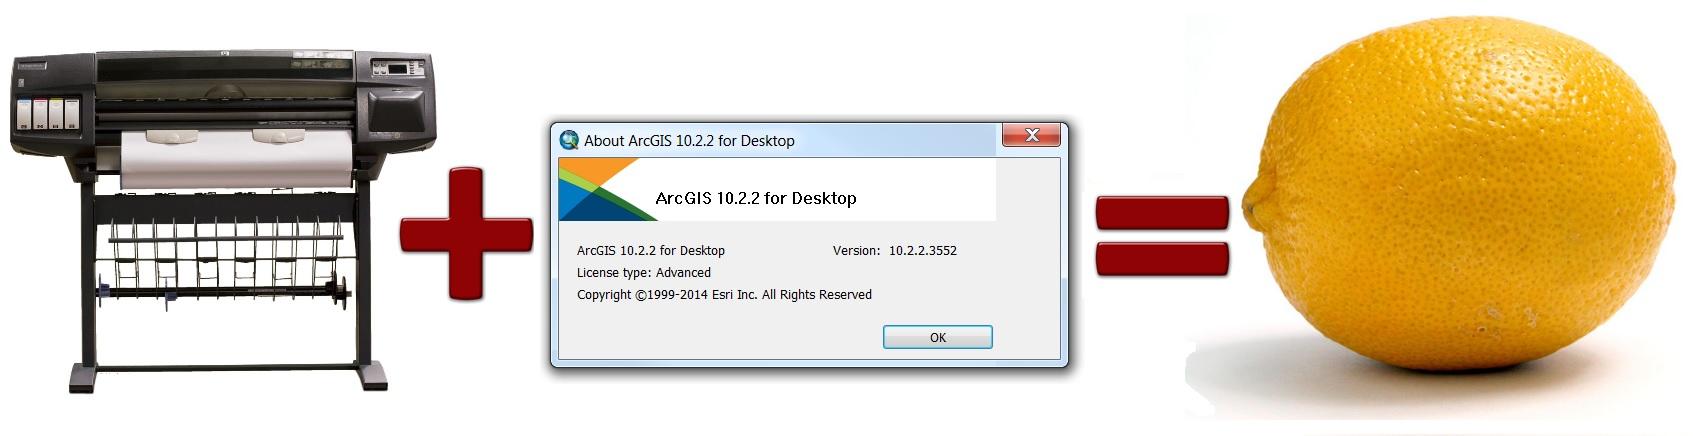 Esri Arcgis For Desktop 10.2 64-Bit